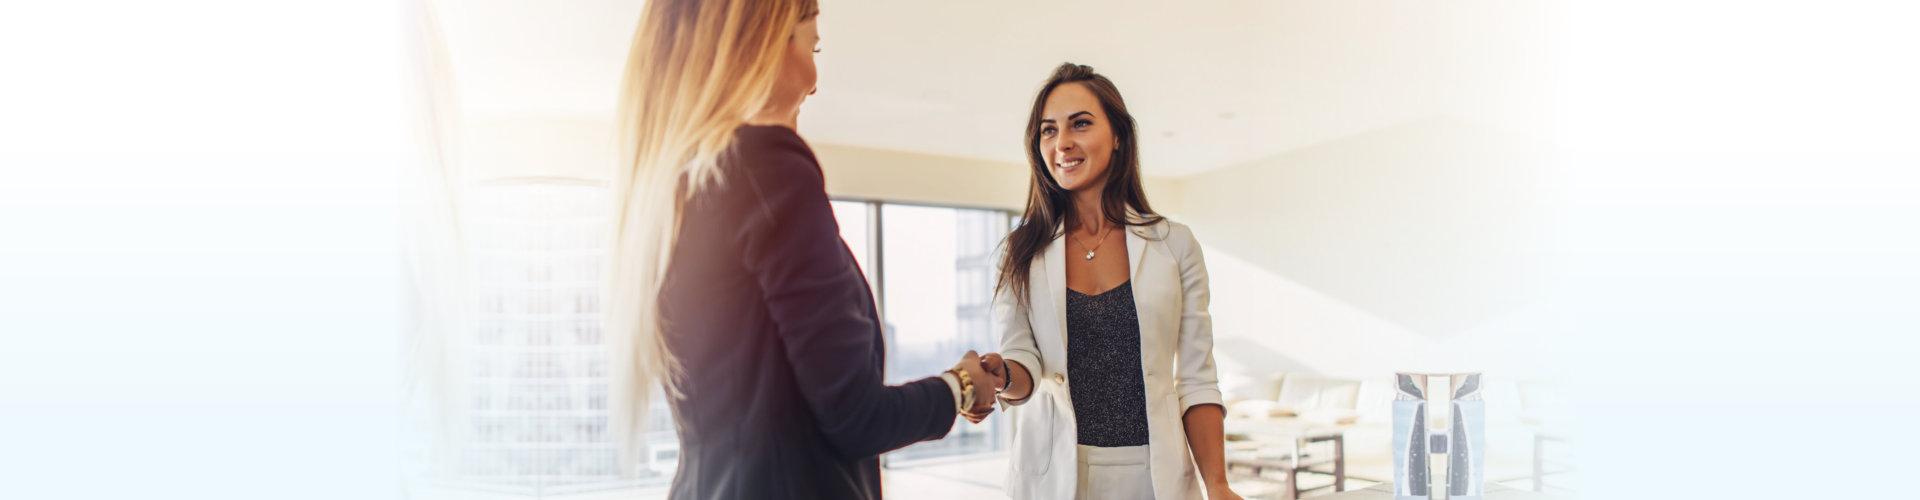 two women having a handshake